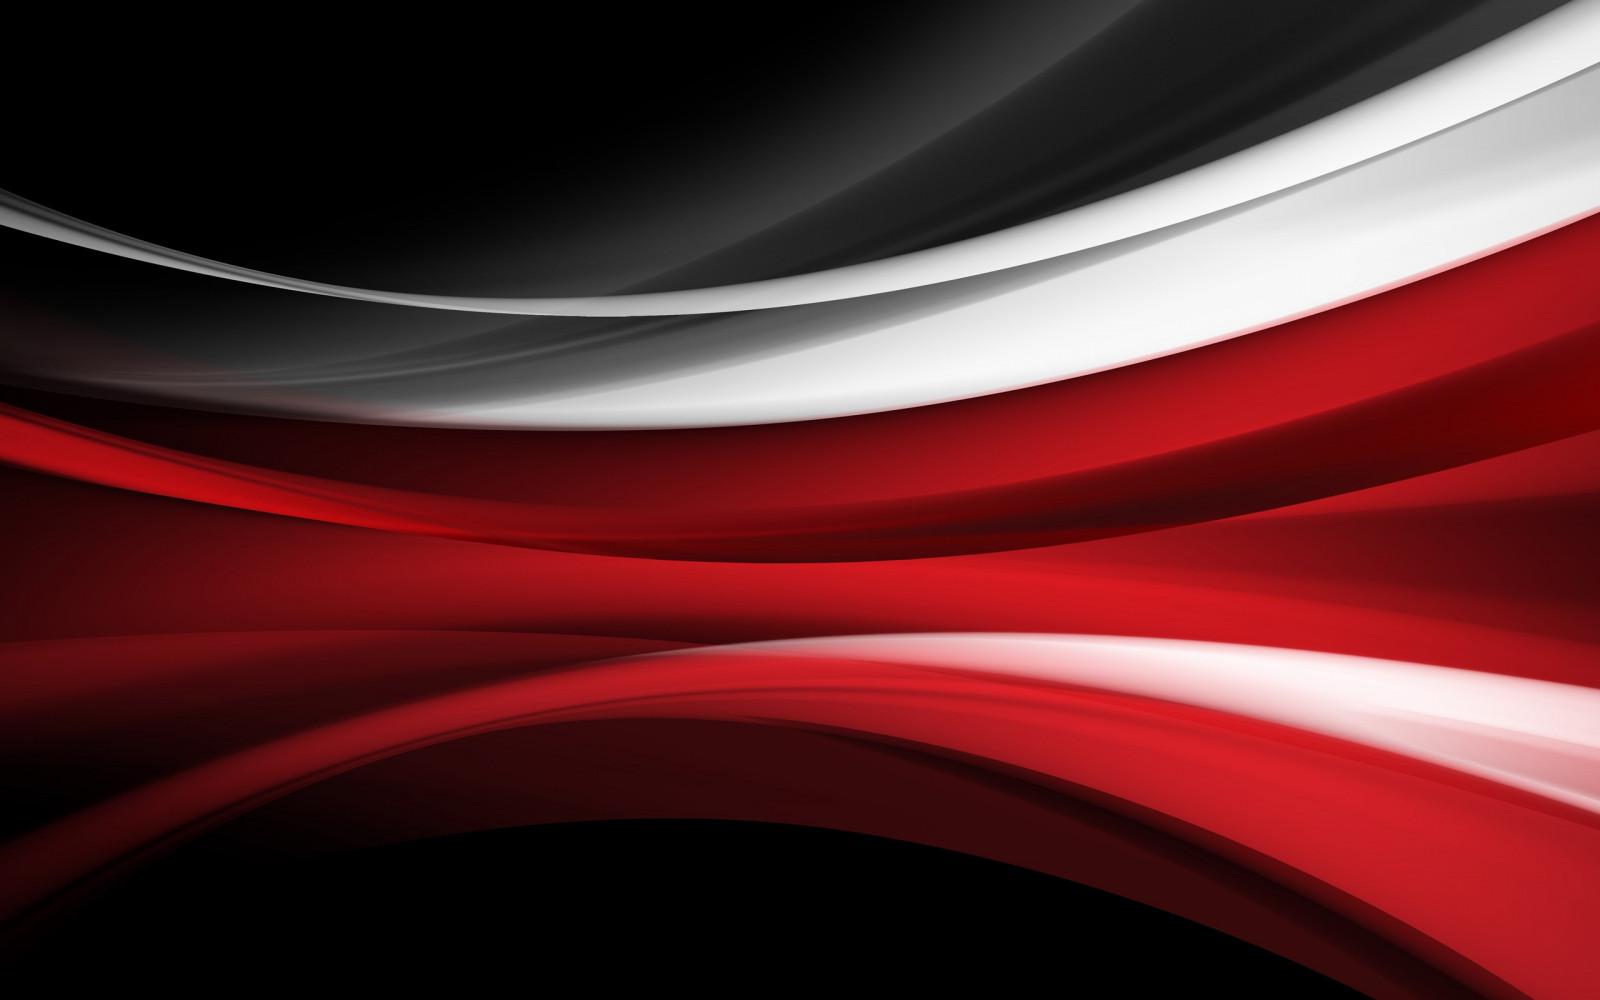 Wallpaper  2560x1600 px abstrak merah garisgaris